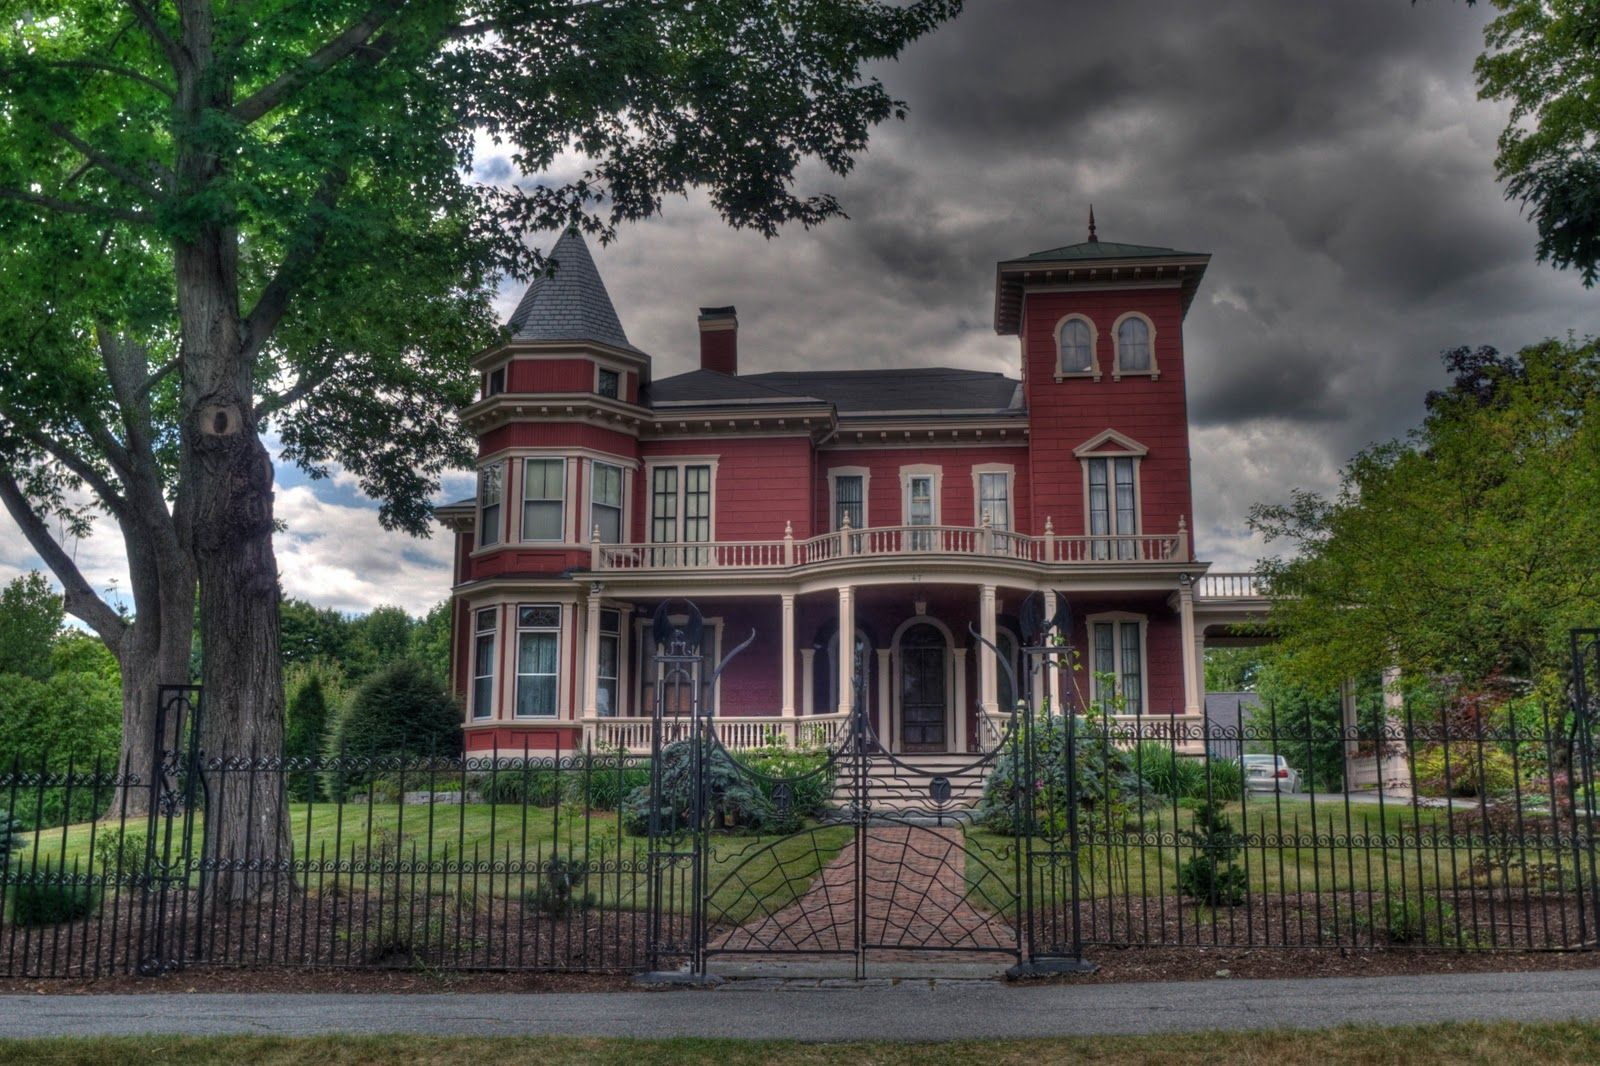 Stephen King's house in Bangor Maine | Daily(ish) Photo ...